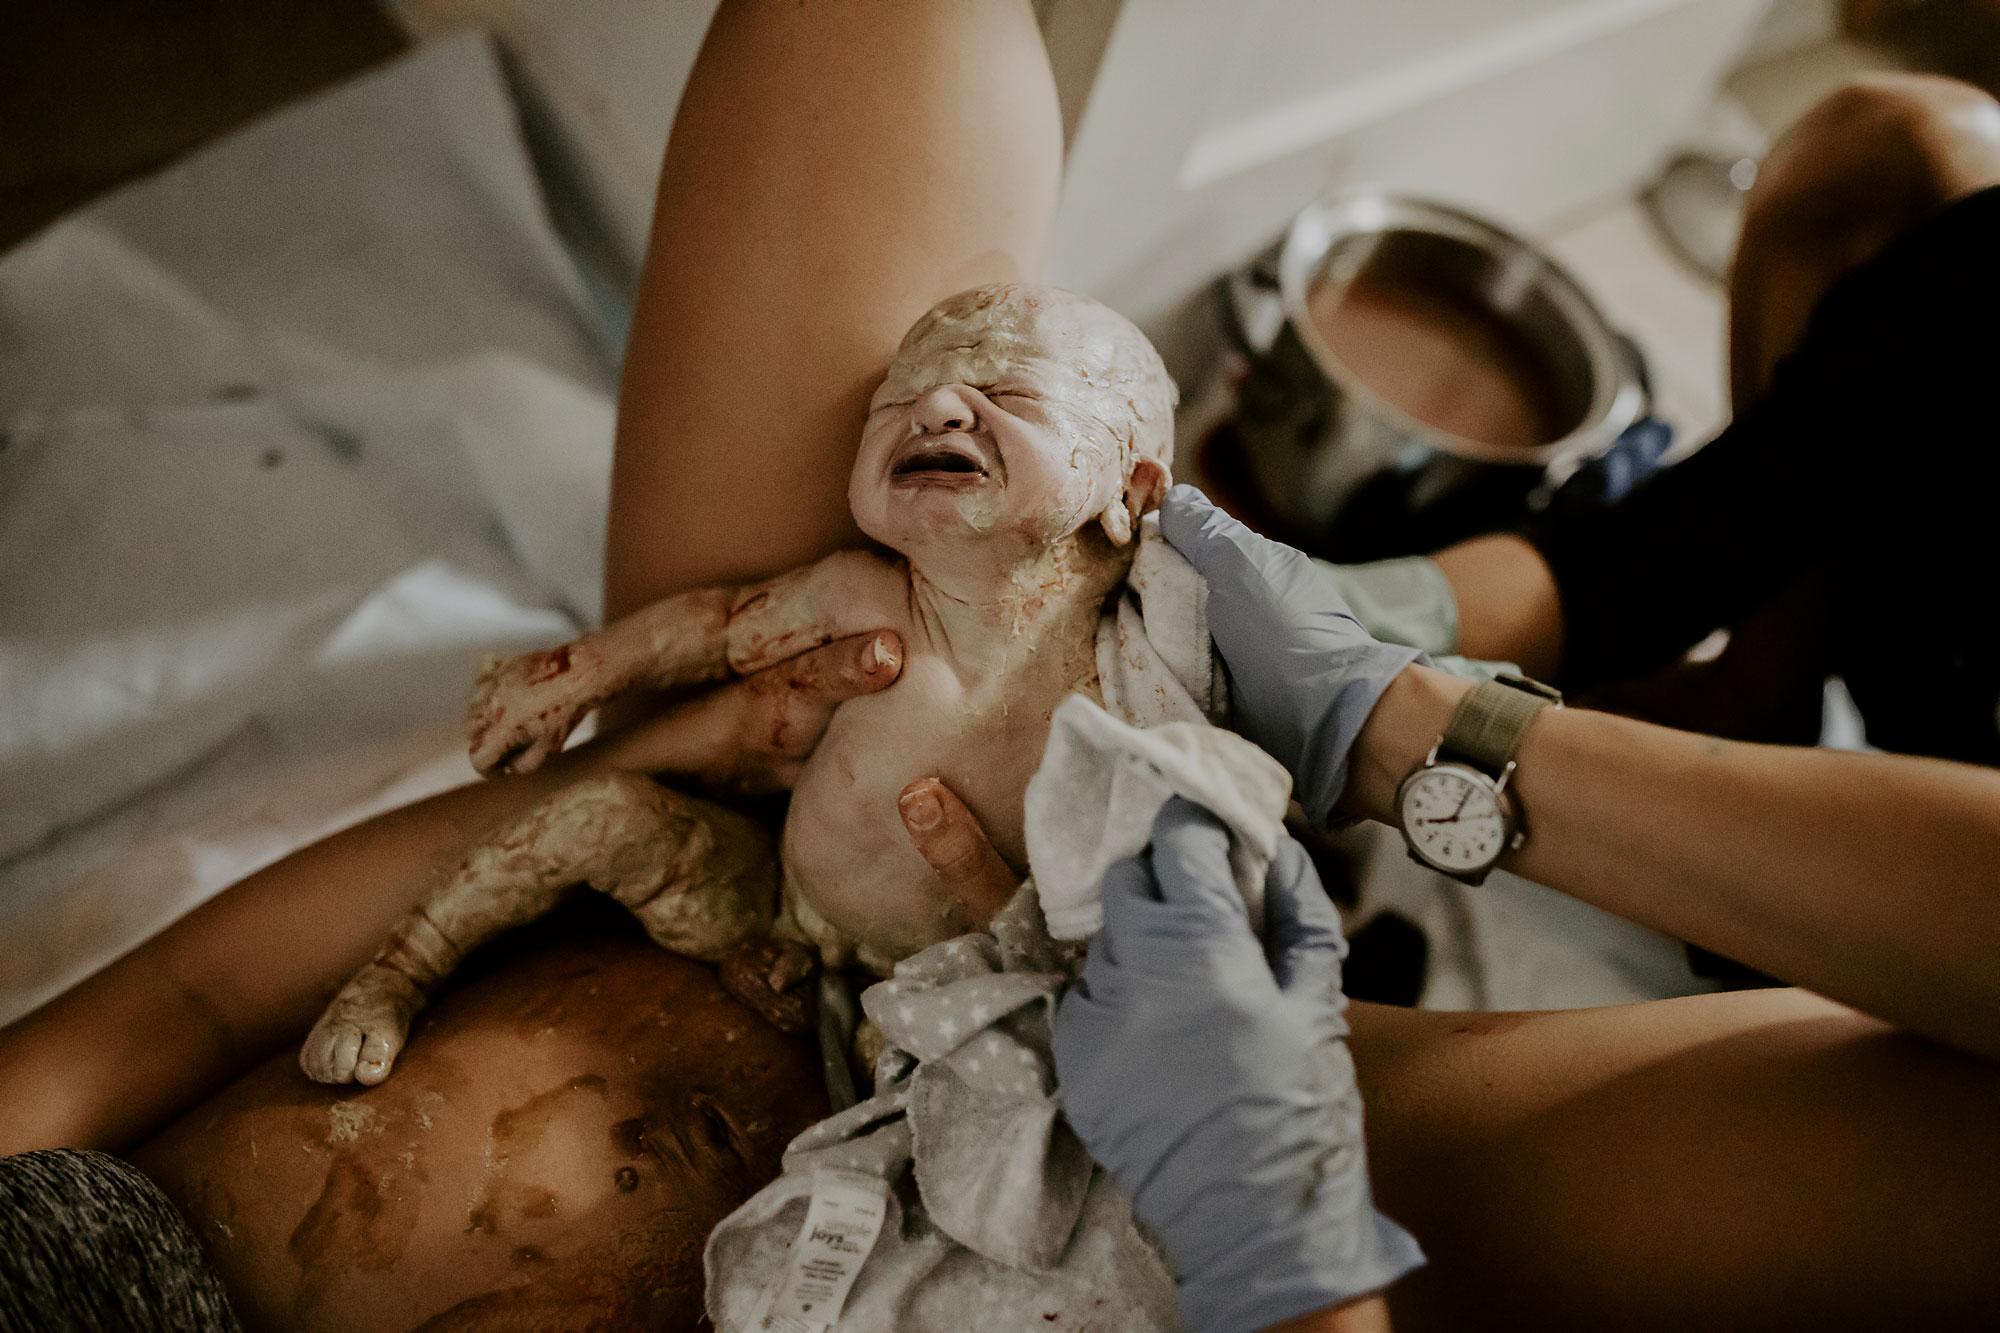 Honolulu-Hawaii-Birth-Photographer-Birth-Video-23.jpg